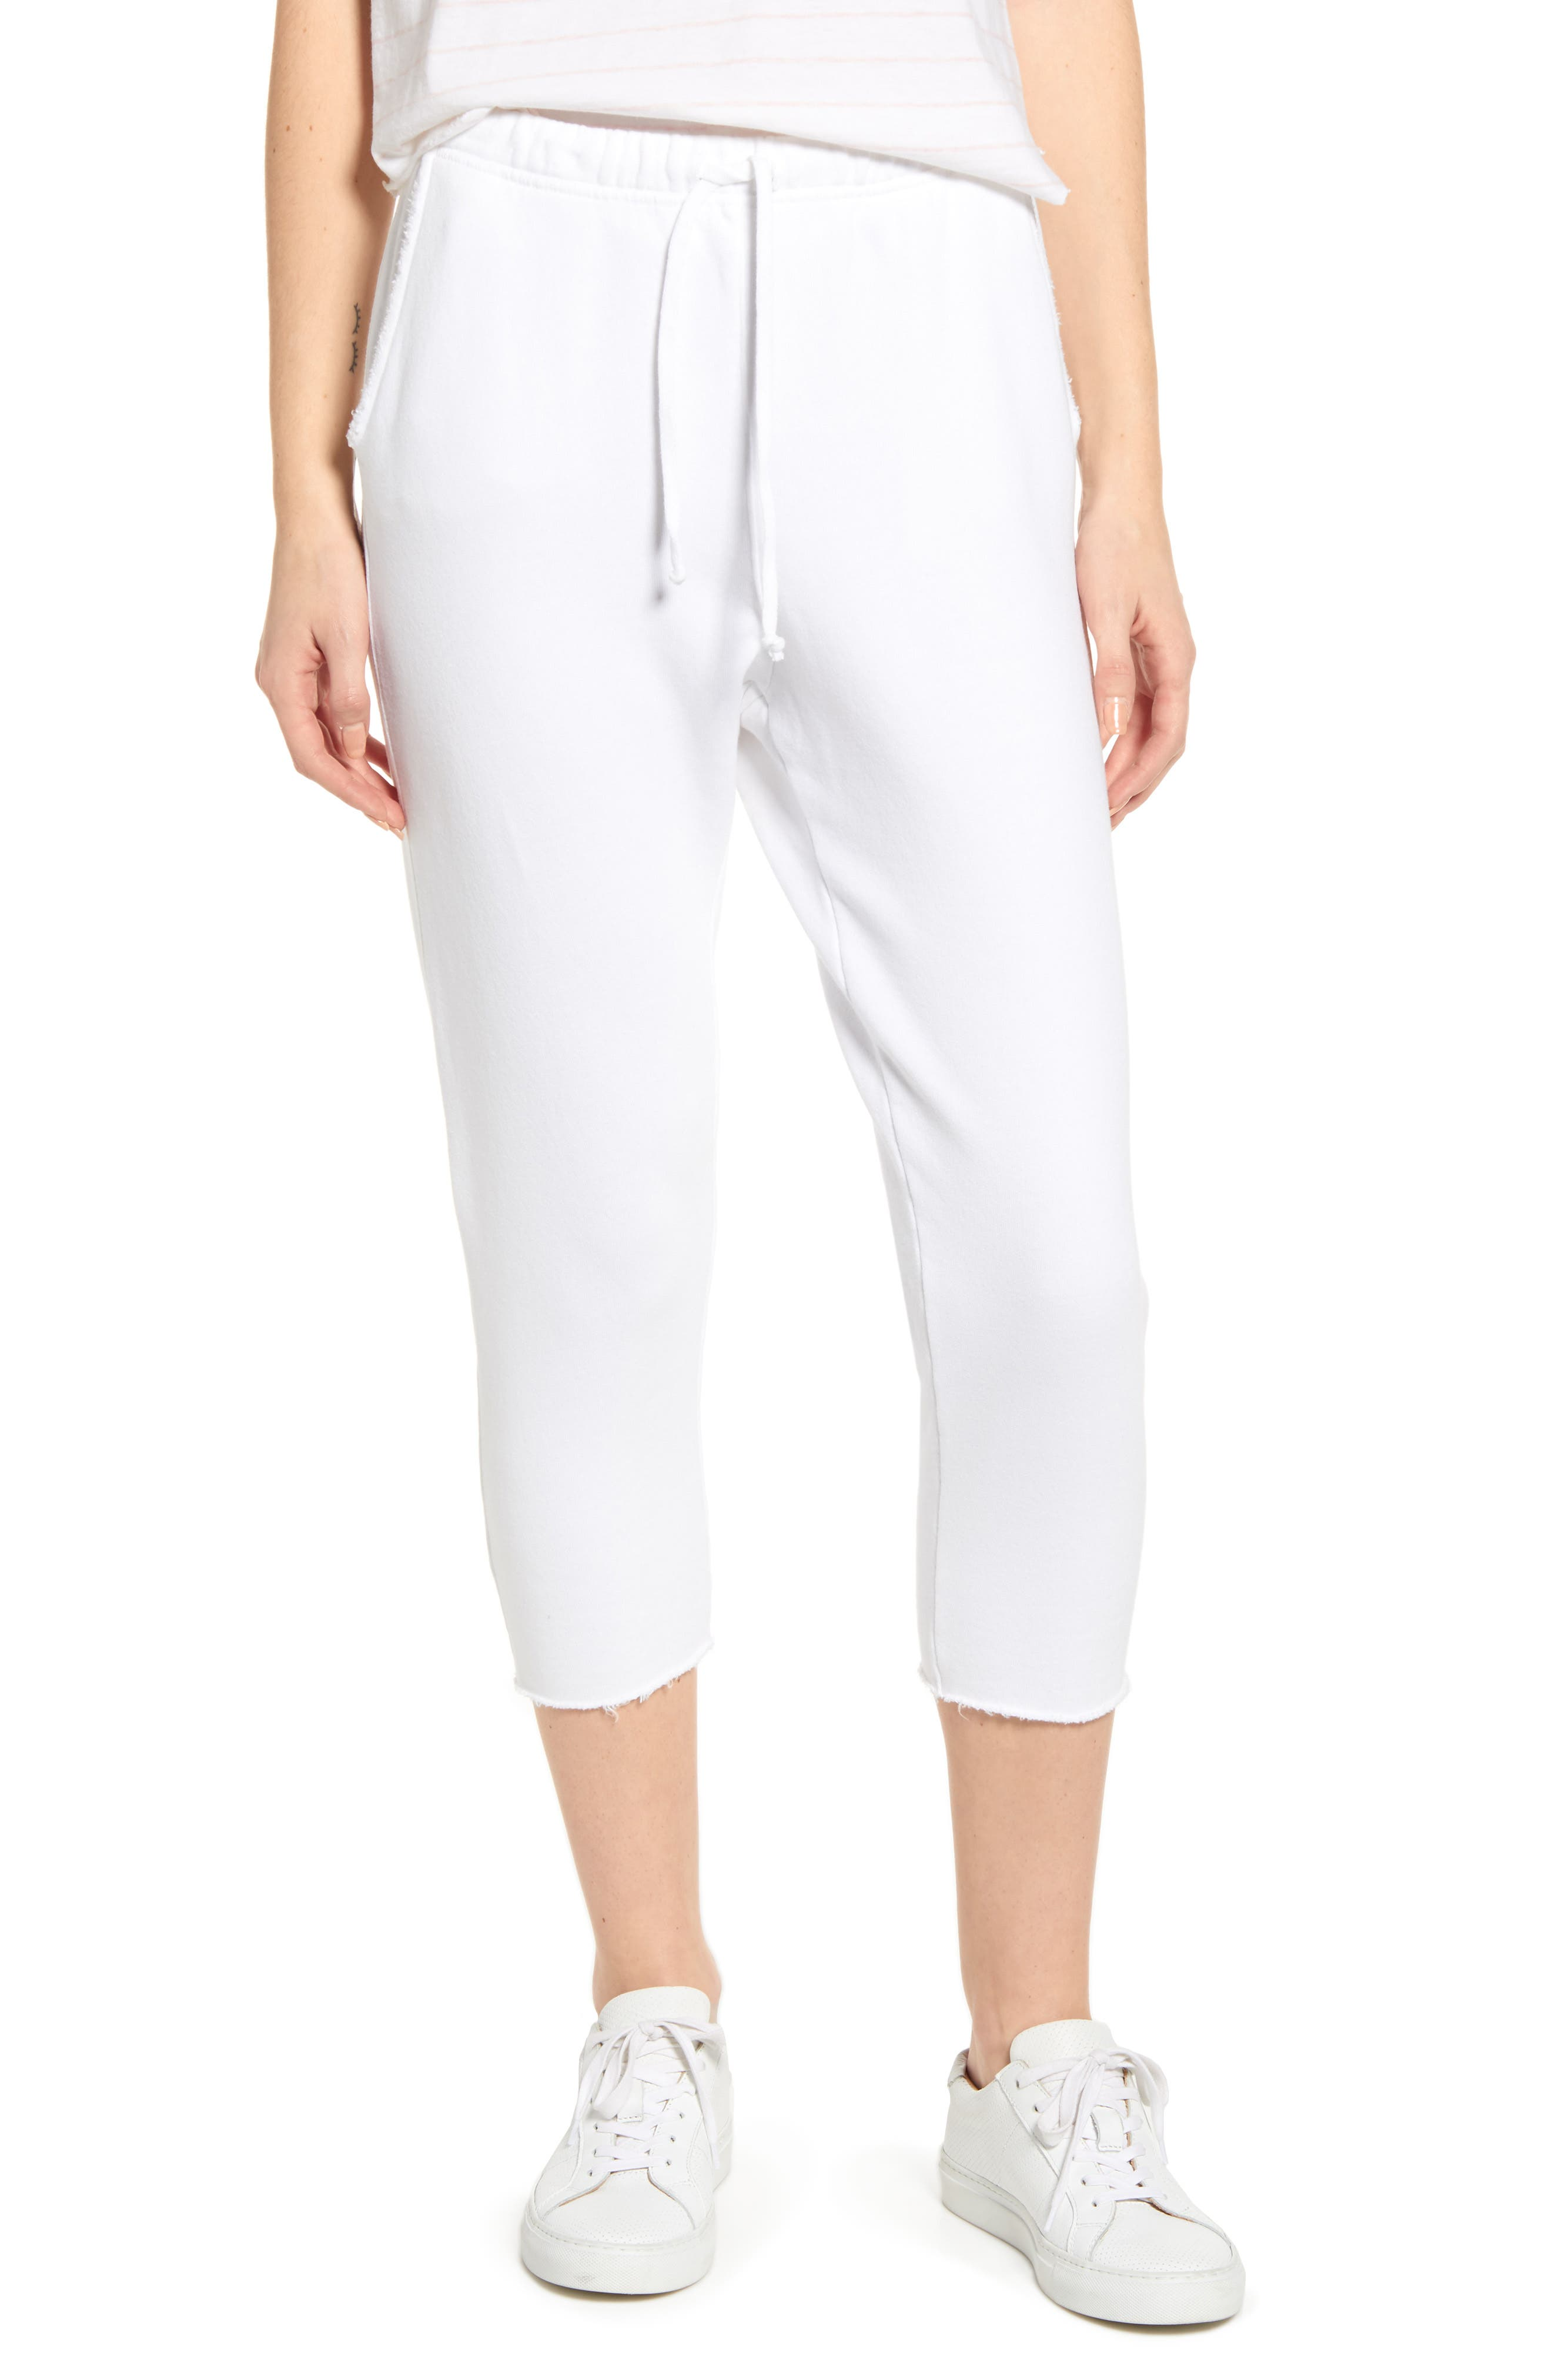 Frank & Eileen Tee Lab Raw Hem Crop Sweatpants, White